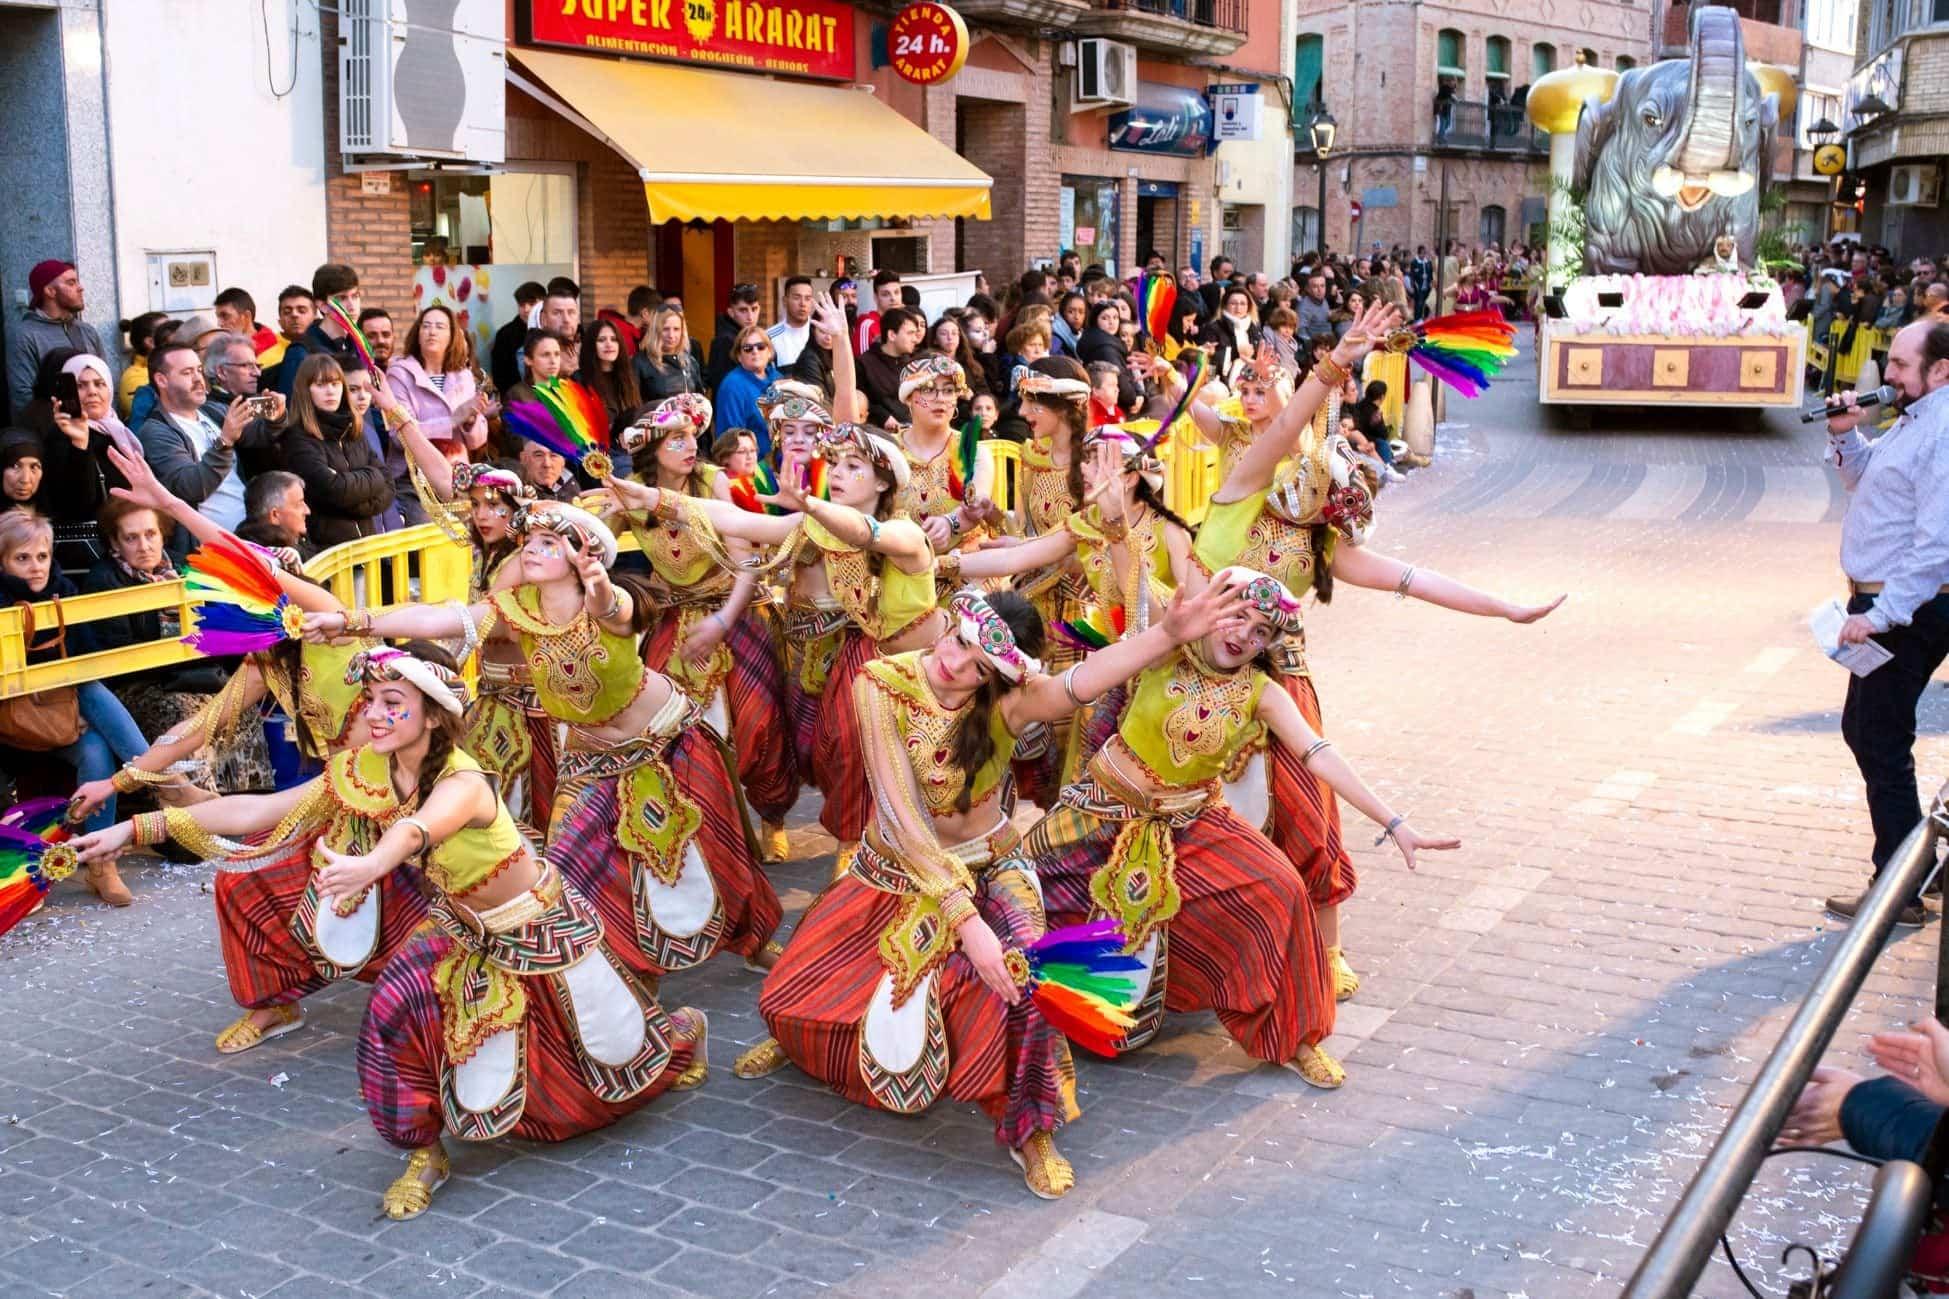 Carnaval de herencia 2020 ofertorio 118 - Selección de fotografías del Ofertorio del Carnaval de Herencia